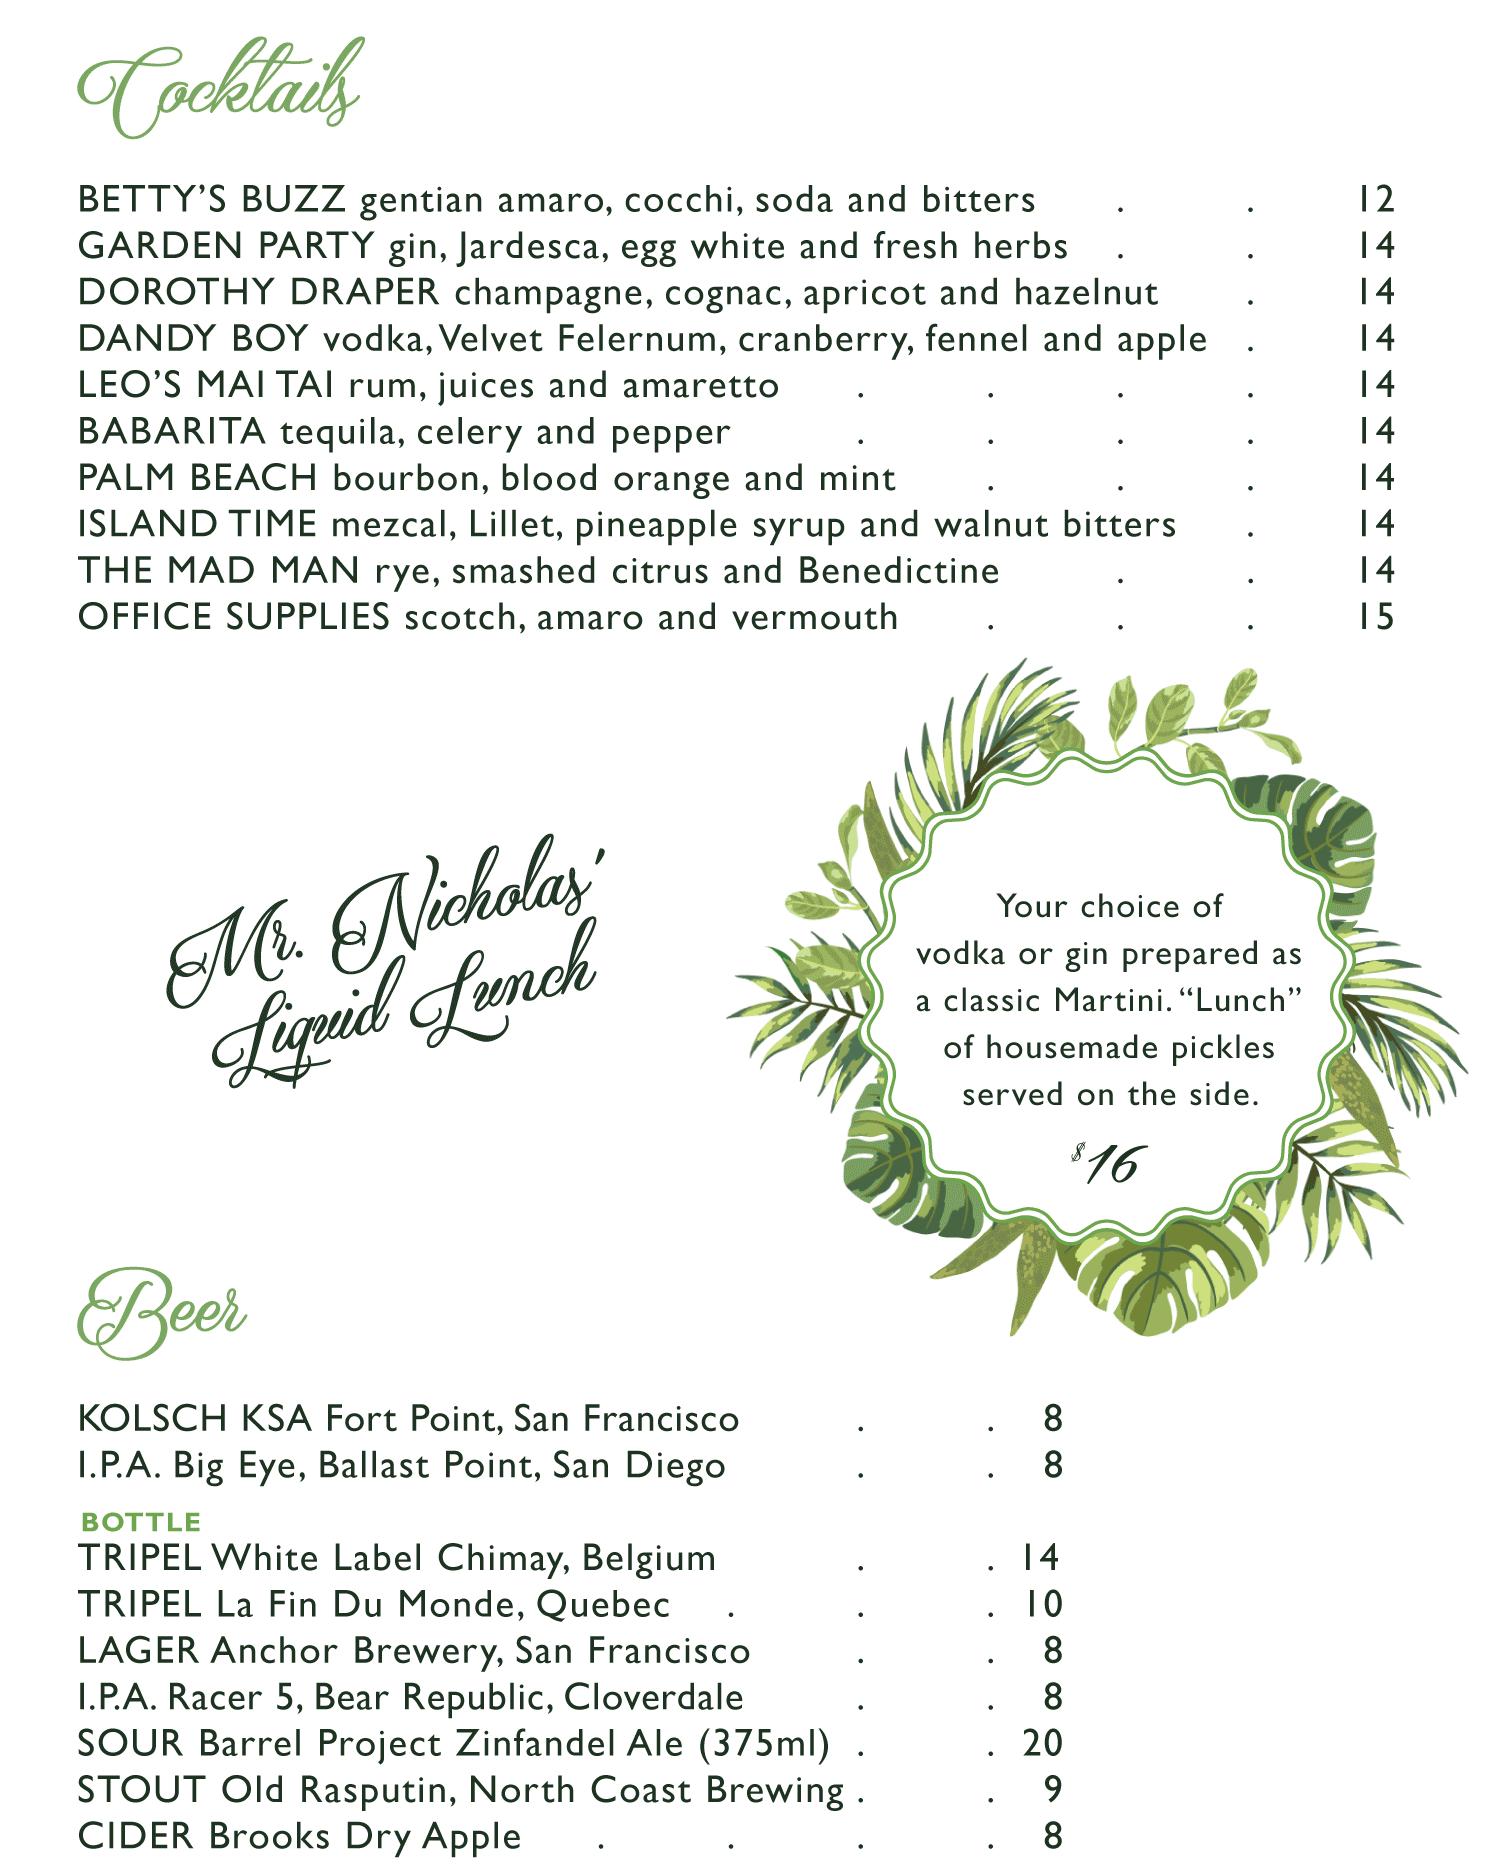 Cocktails-4.13.17